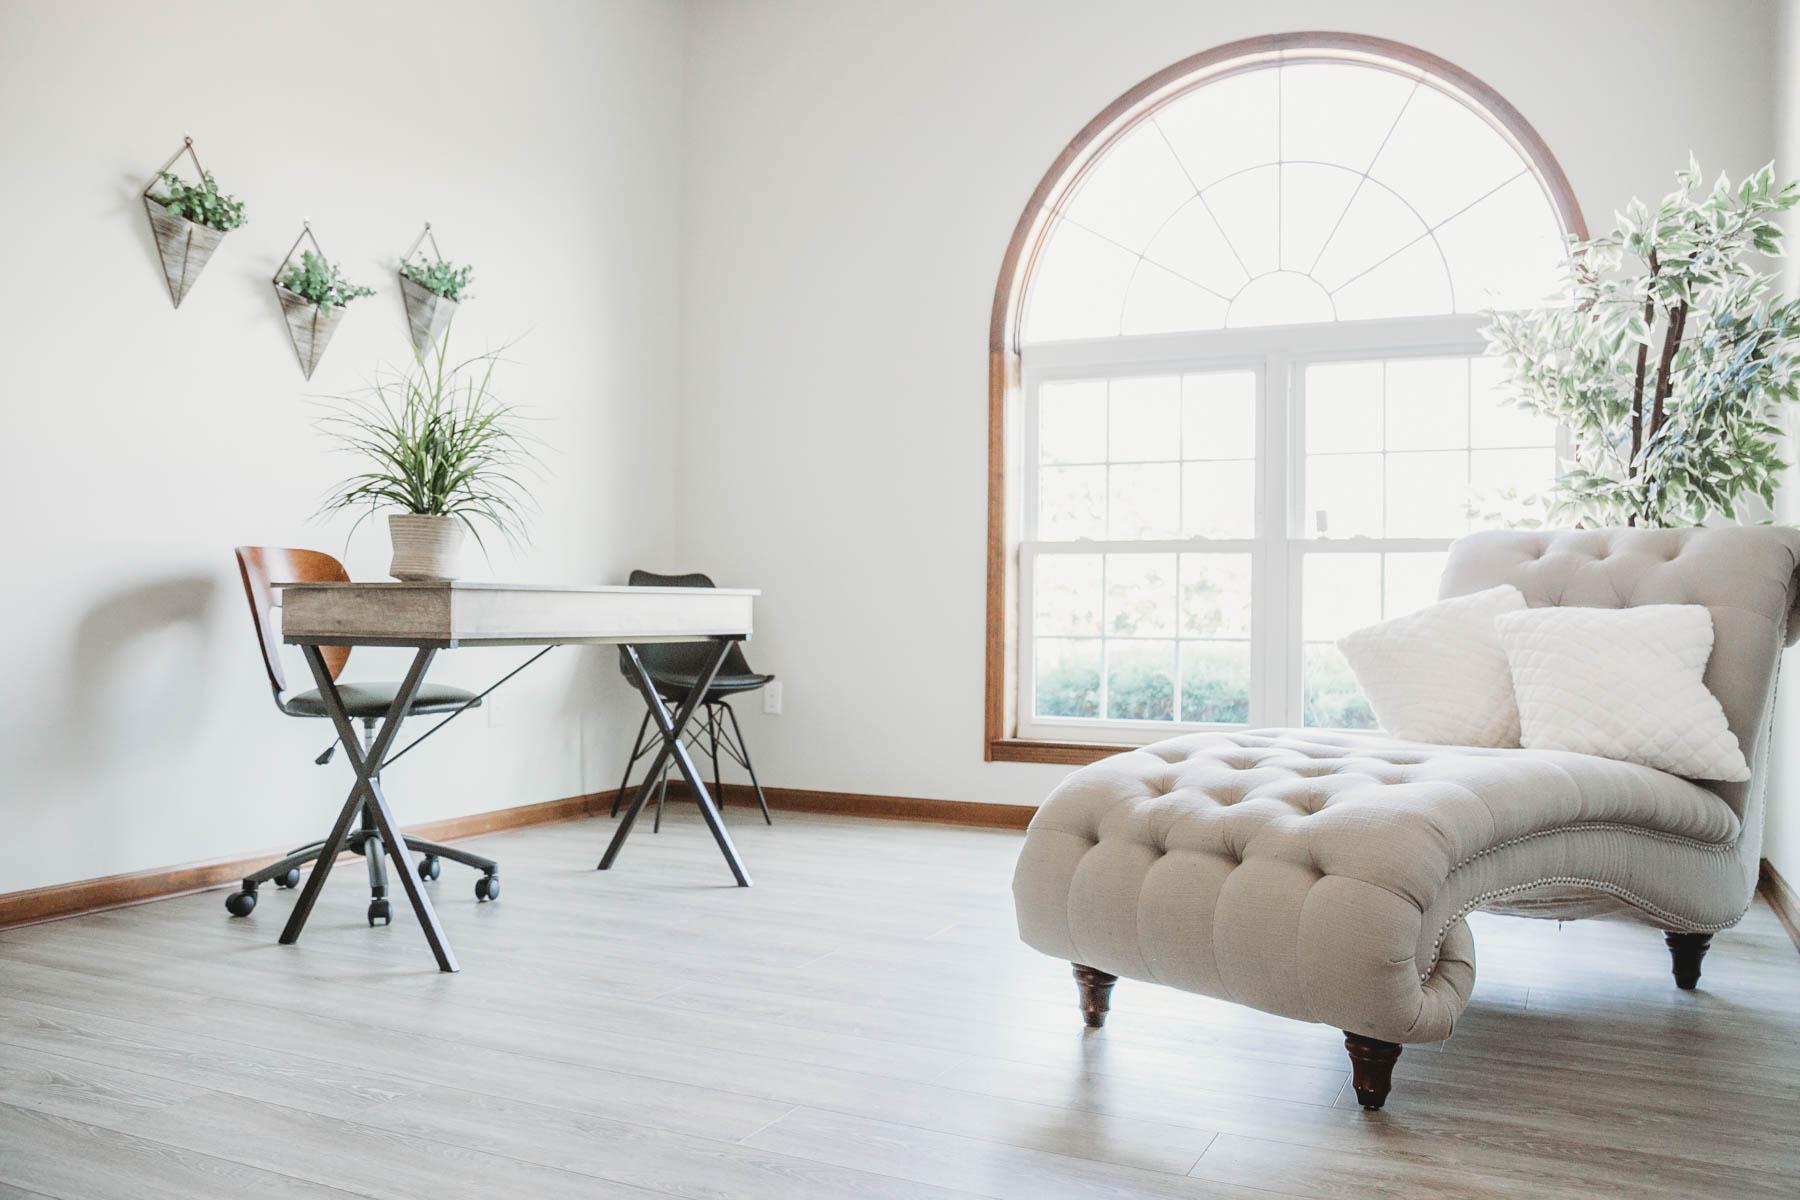 Chattanooga Photography Studio for Rent